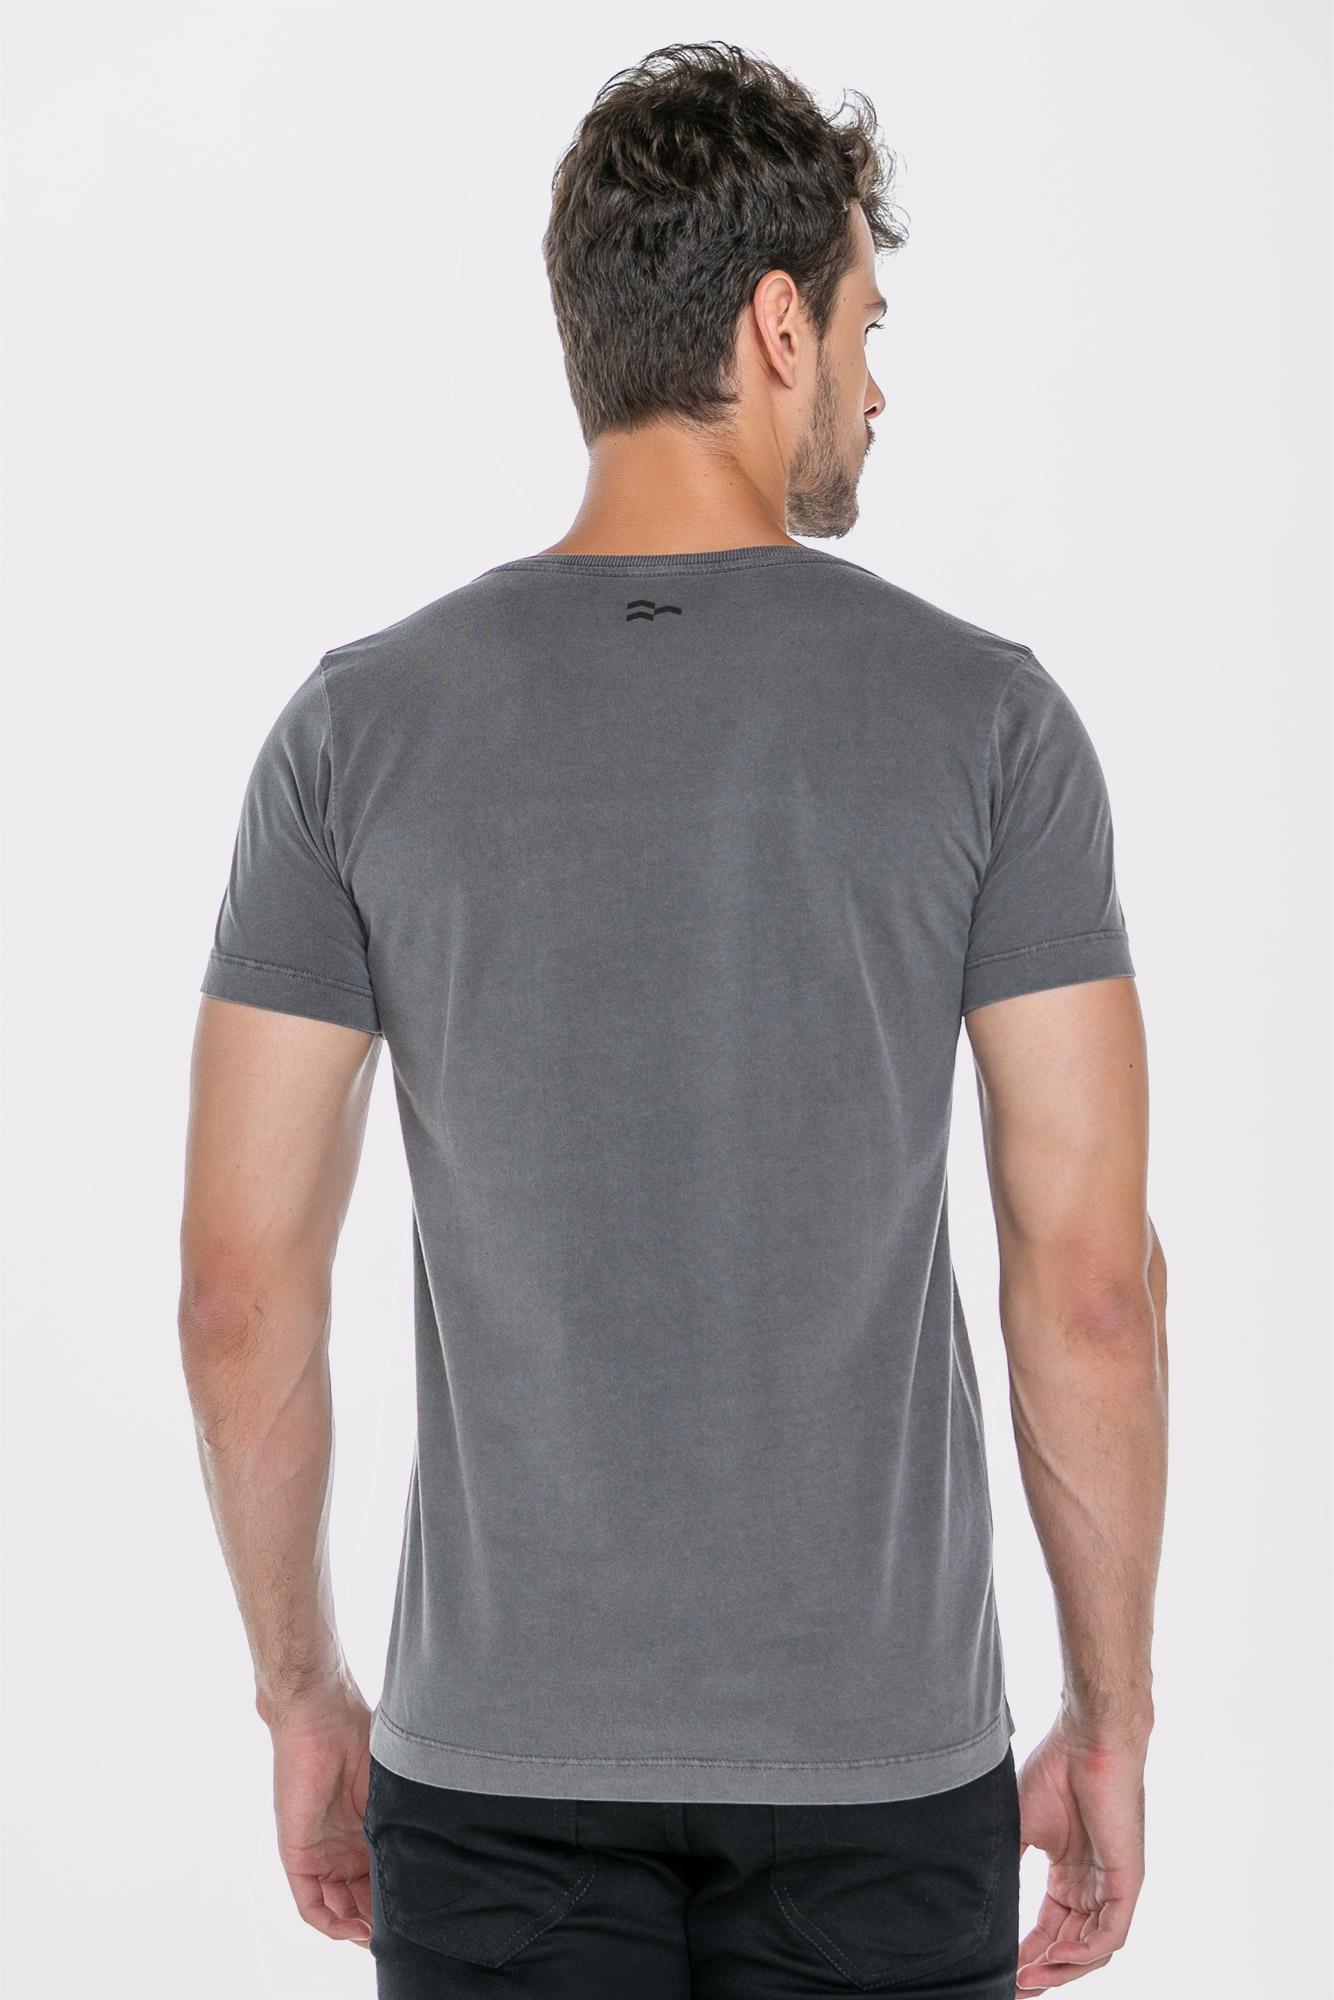 Camiseta Fresh Beginning